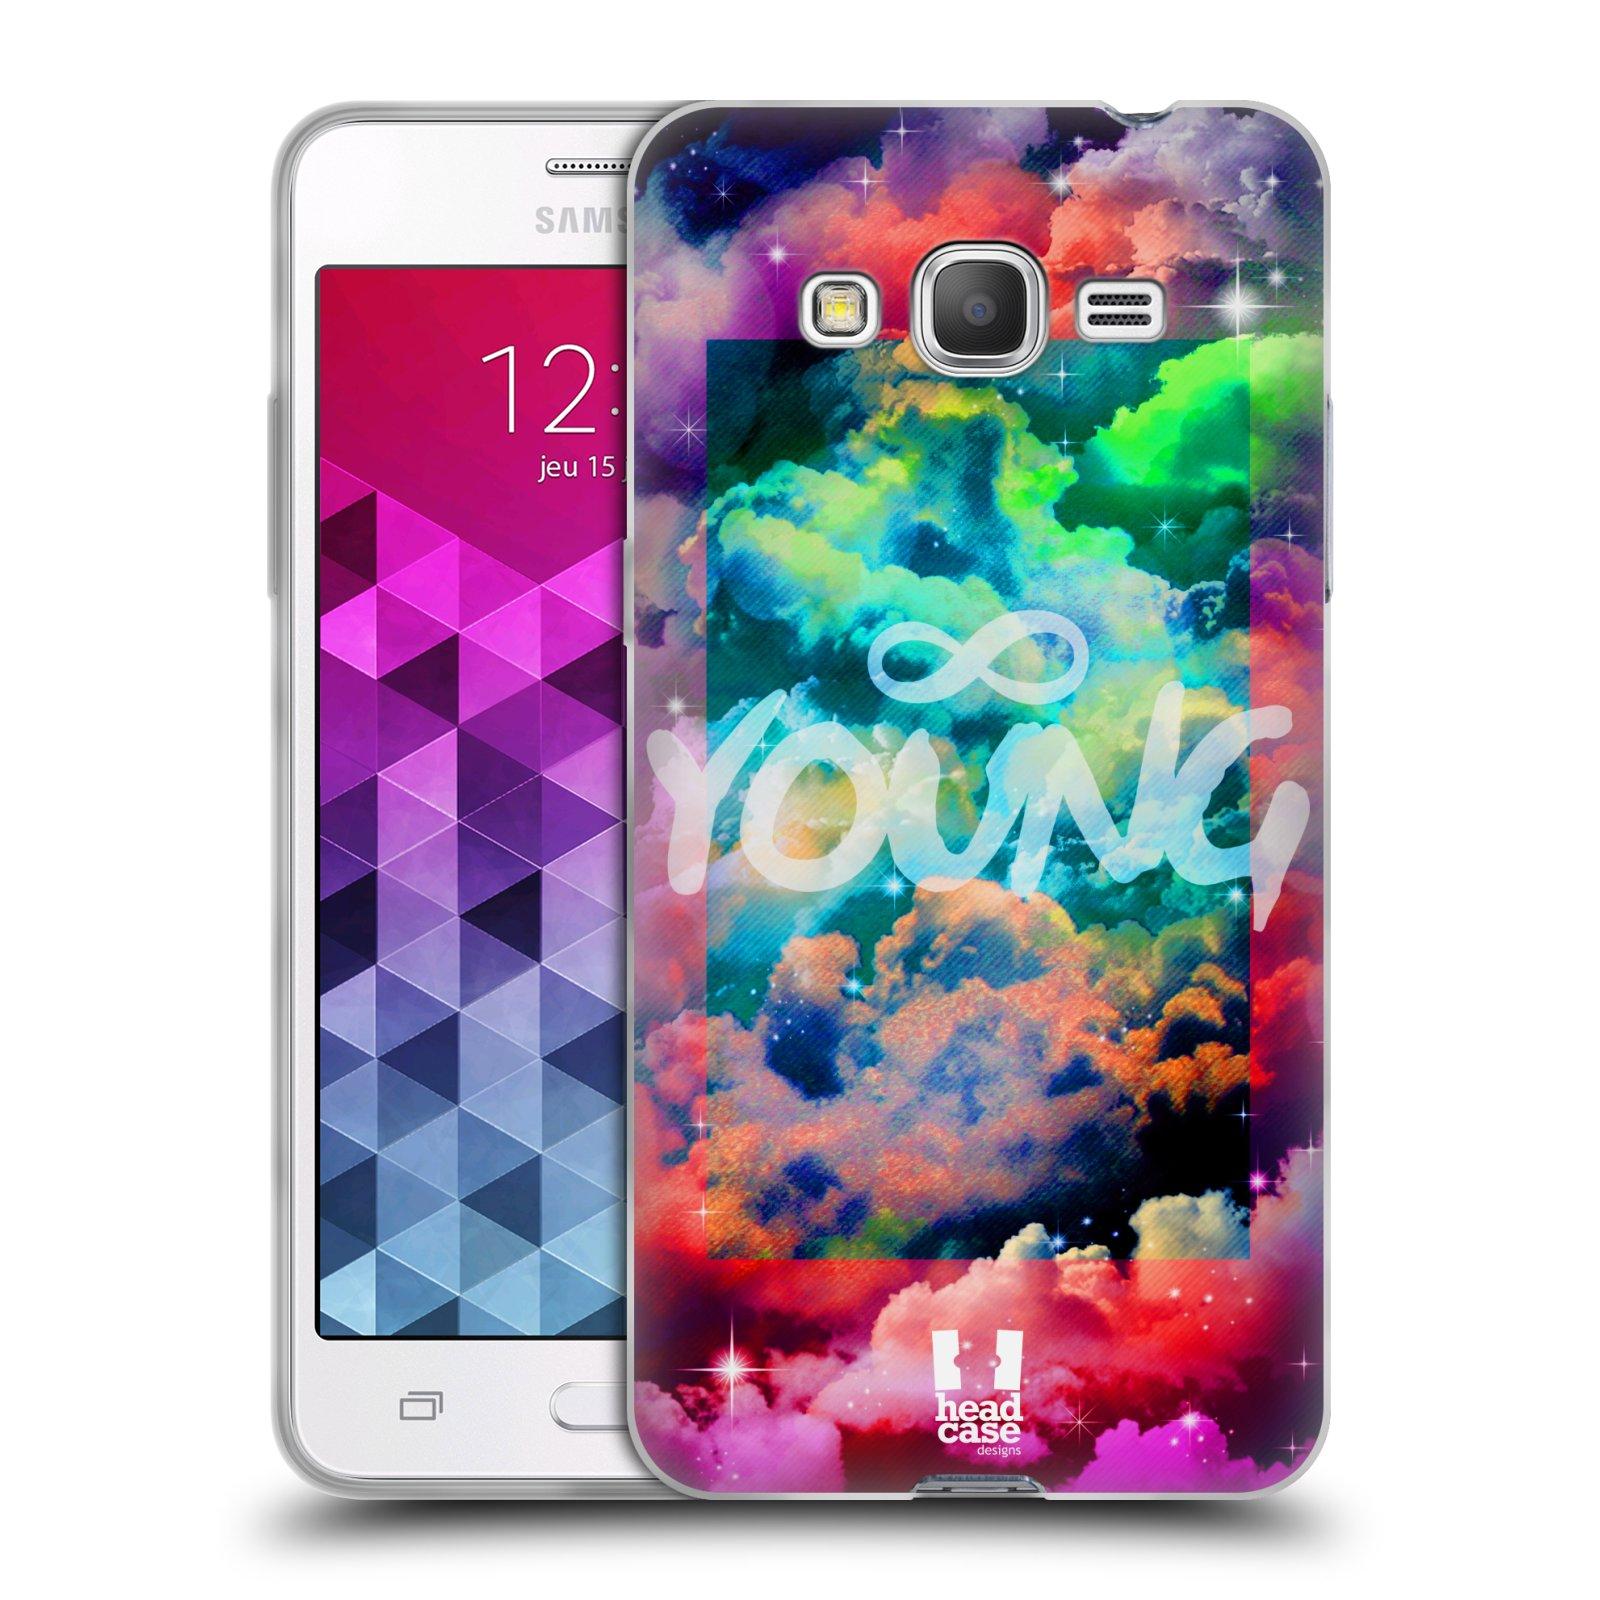 Silikonové pouzdro na mobil Samsung Galaxy Grand Prime VE HEAD CASE CHROMATIC YOUNG